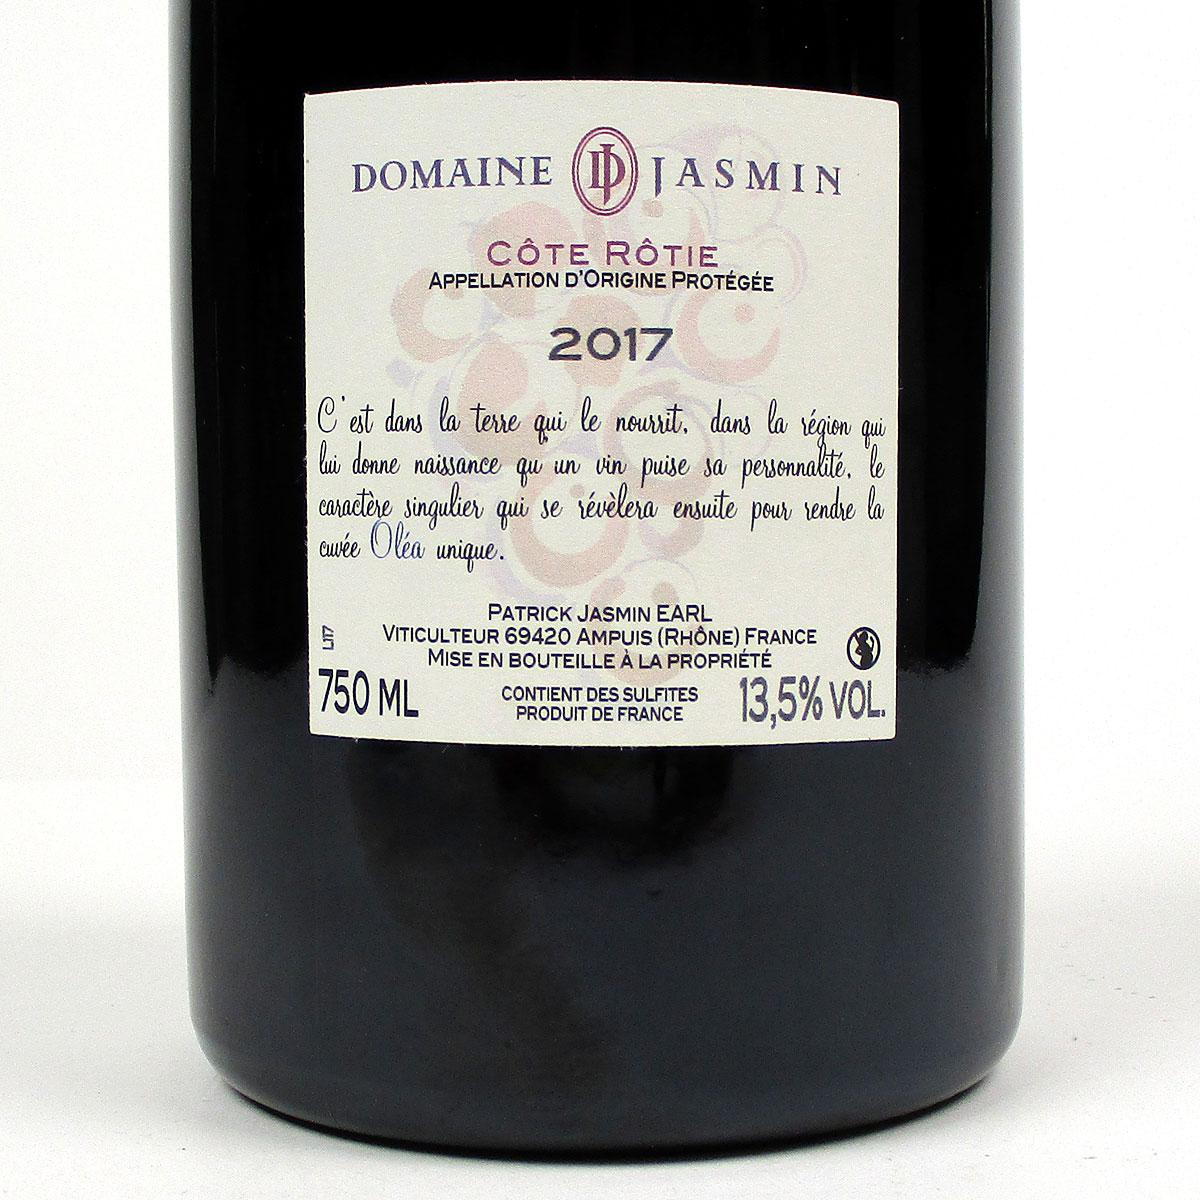 Côte Rôtie: Patrick Jasmin 'Oléa' 2017 - Bottle Rear Label